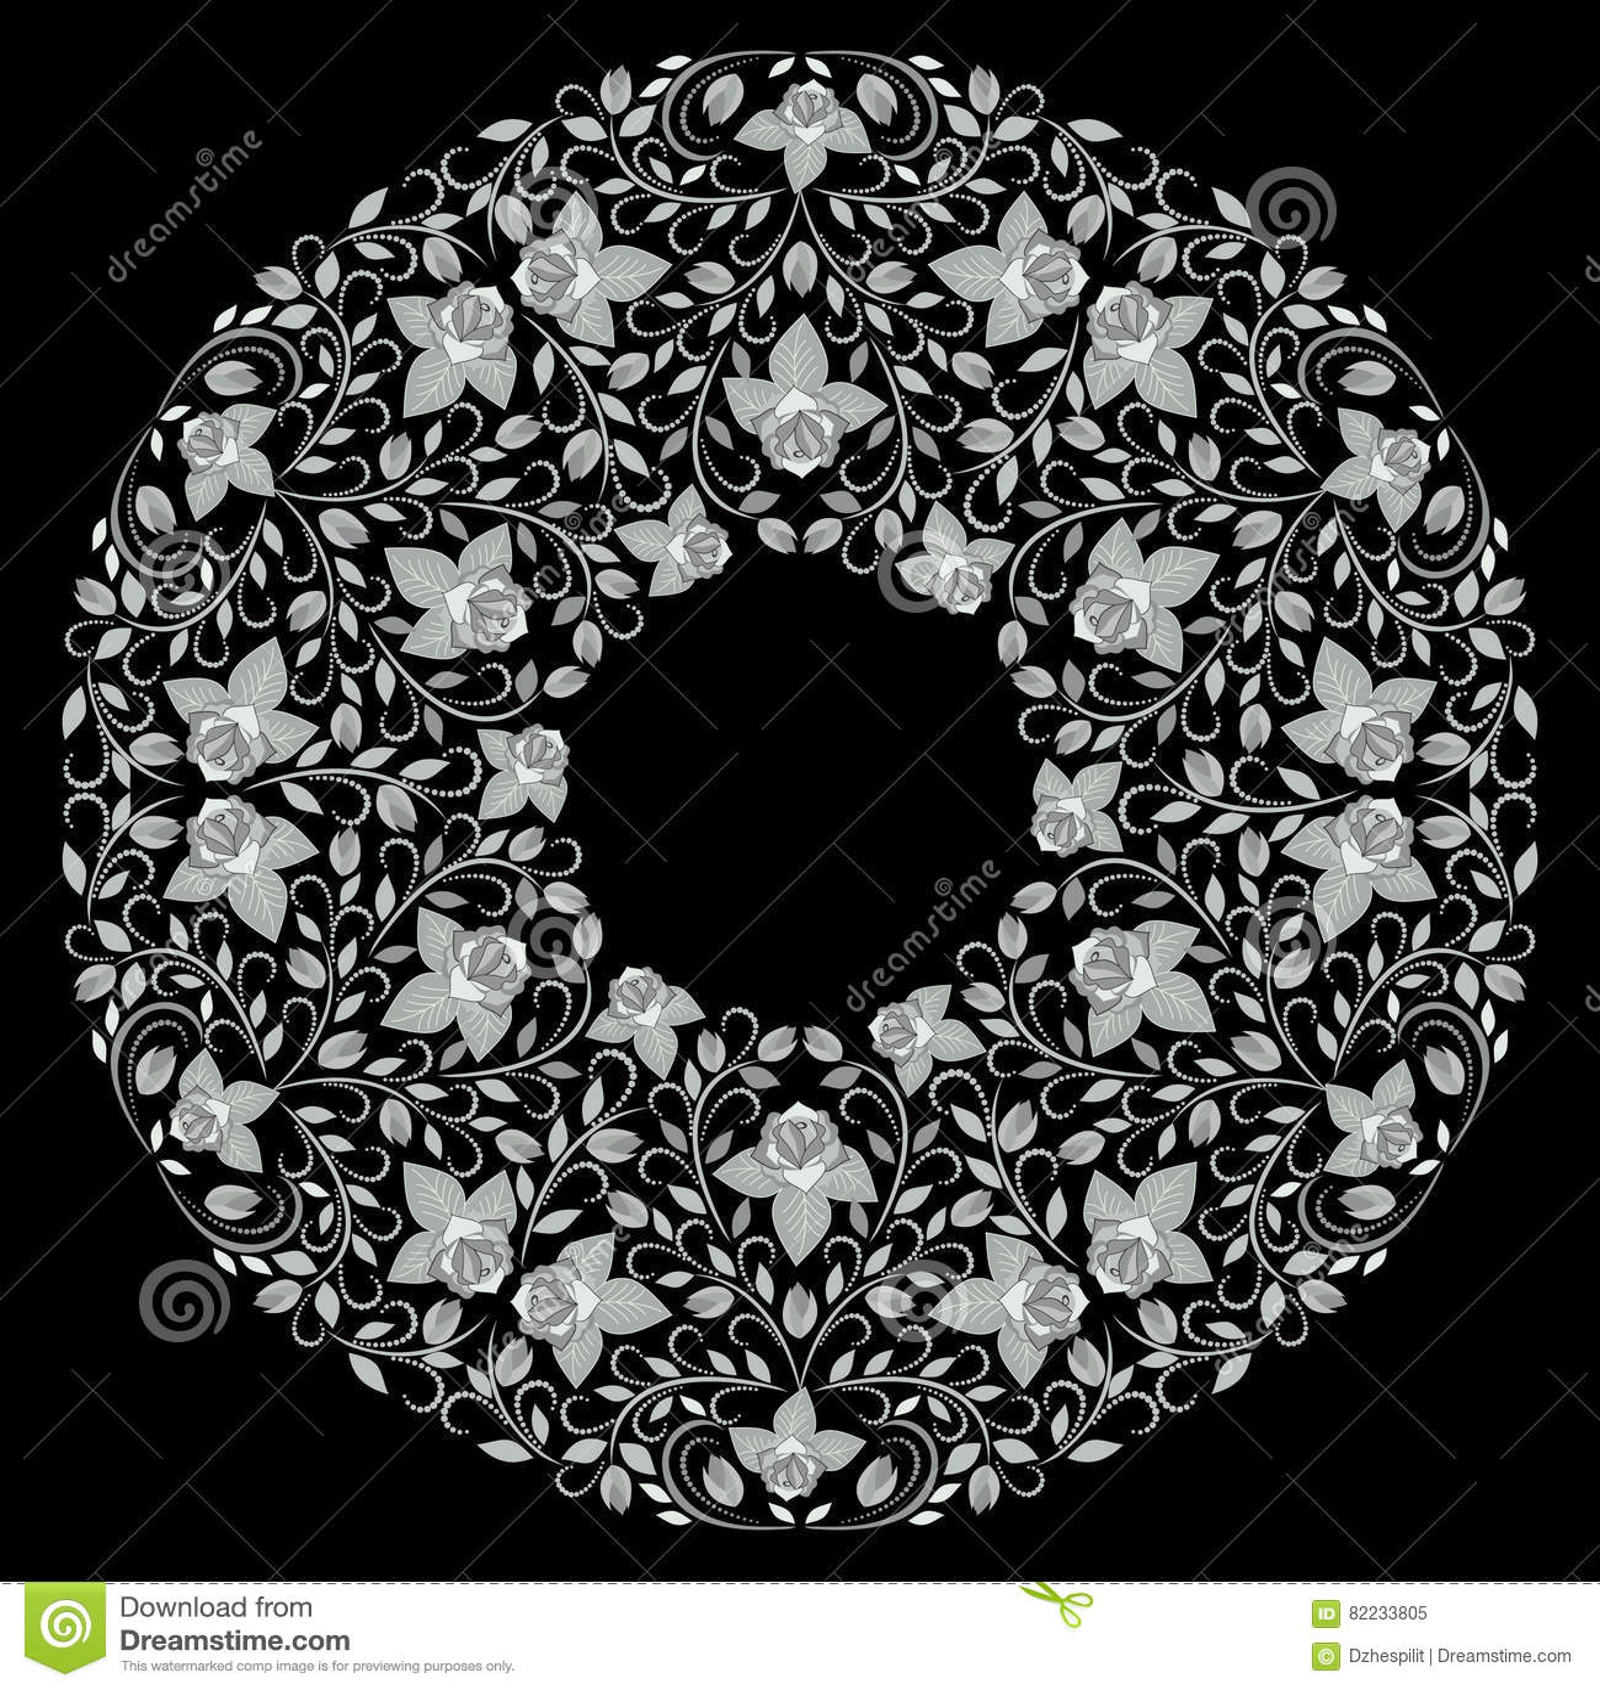 Mandala rose design black and white ornamental bohemian round pattern